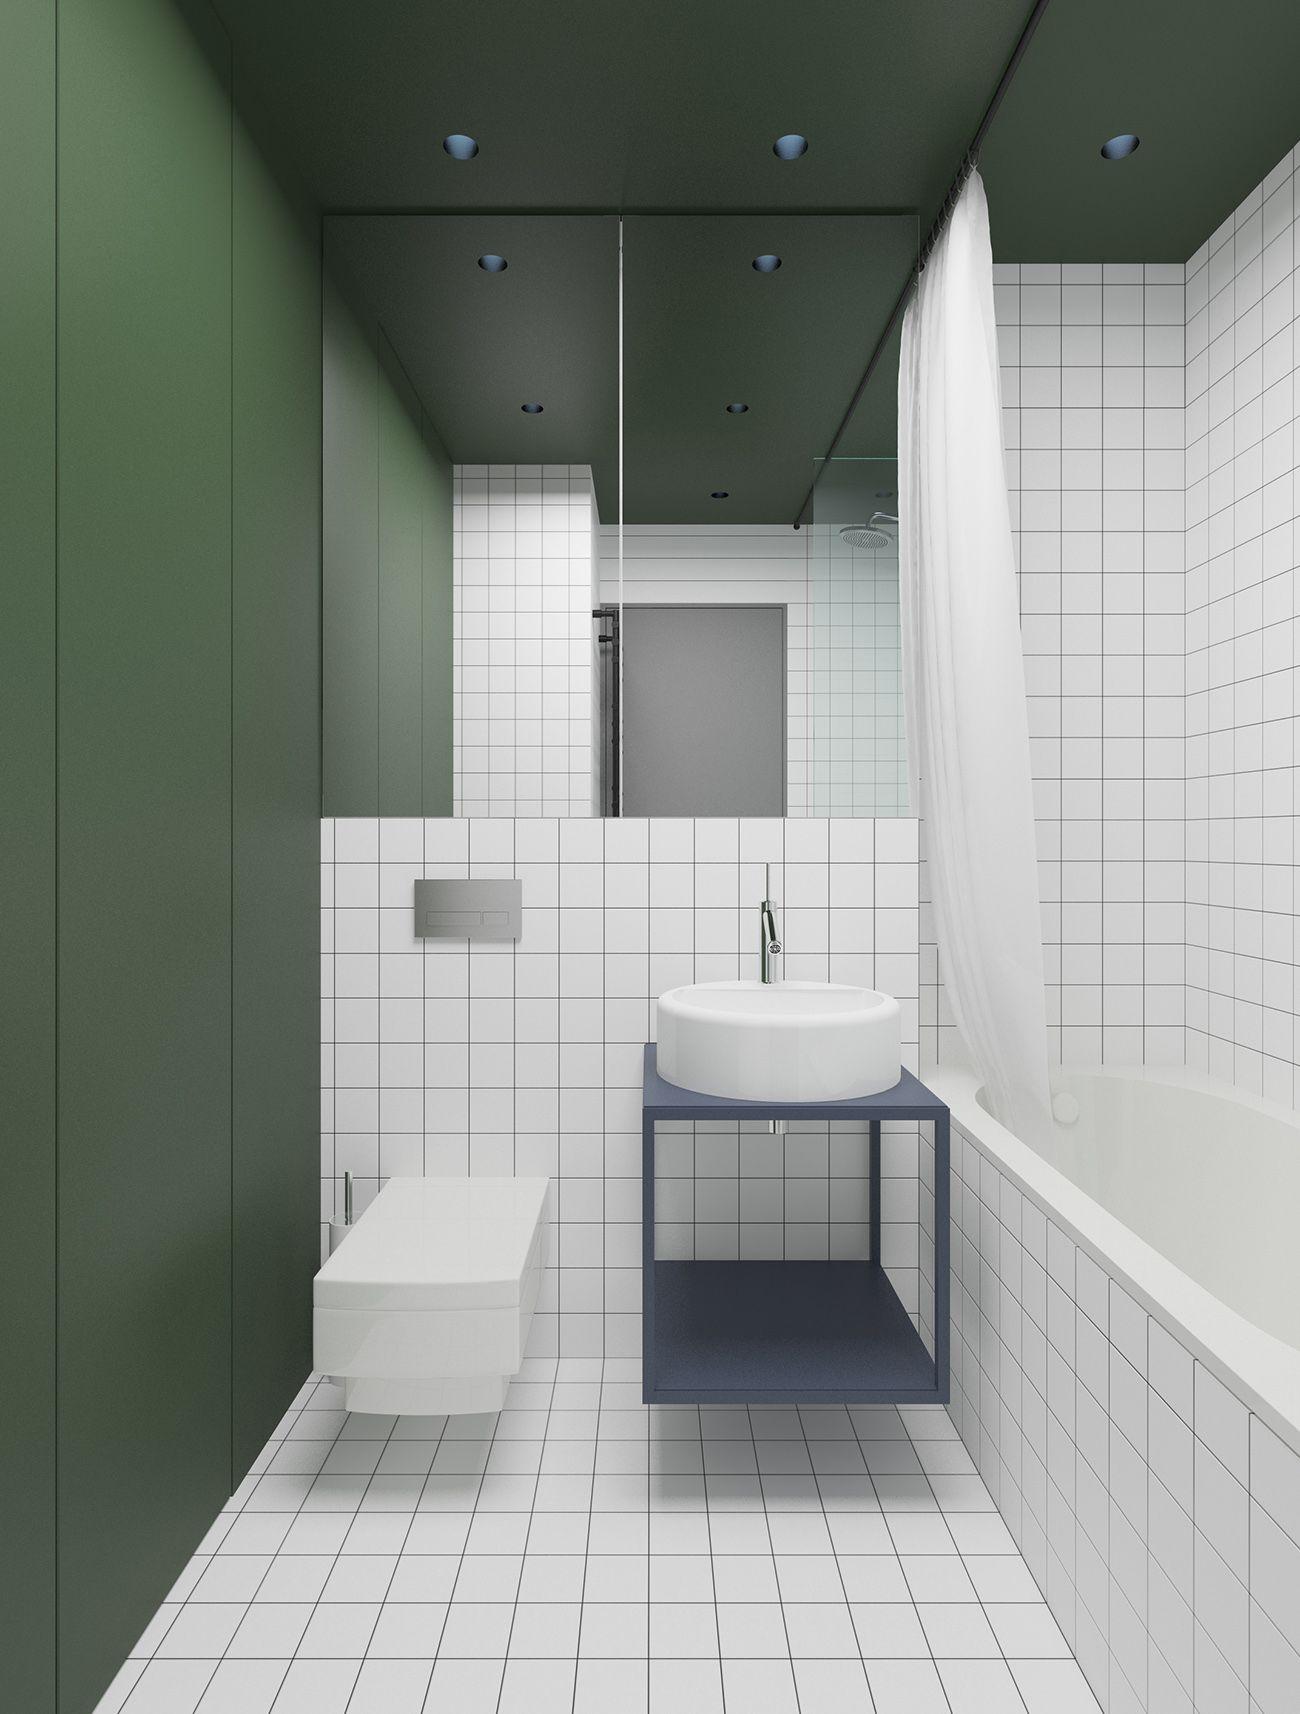 Hoffman interior design bathroom pinterest for Kacheln badezimmer